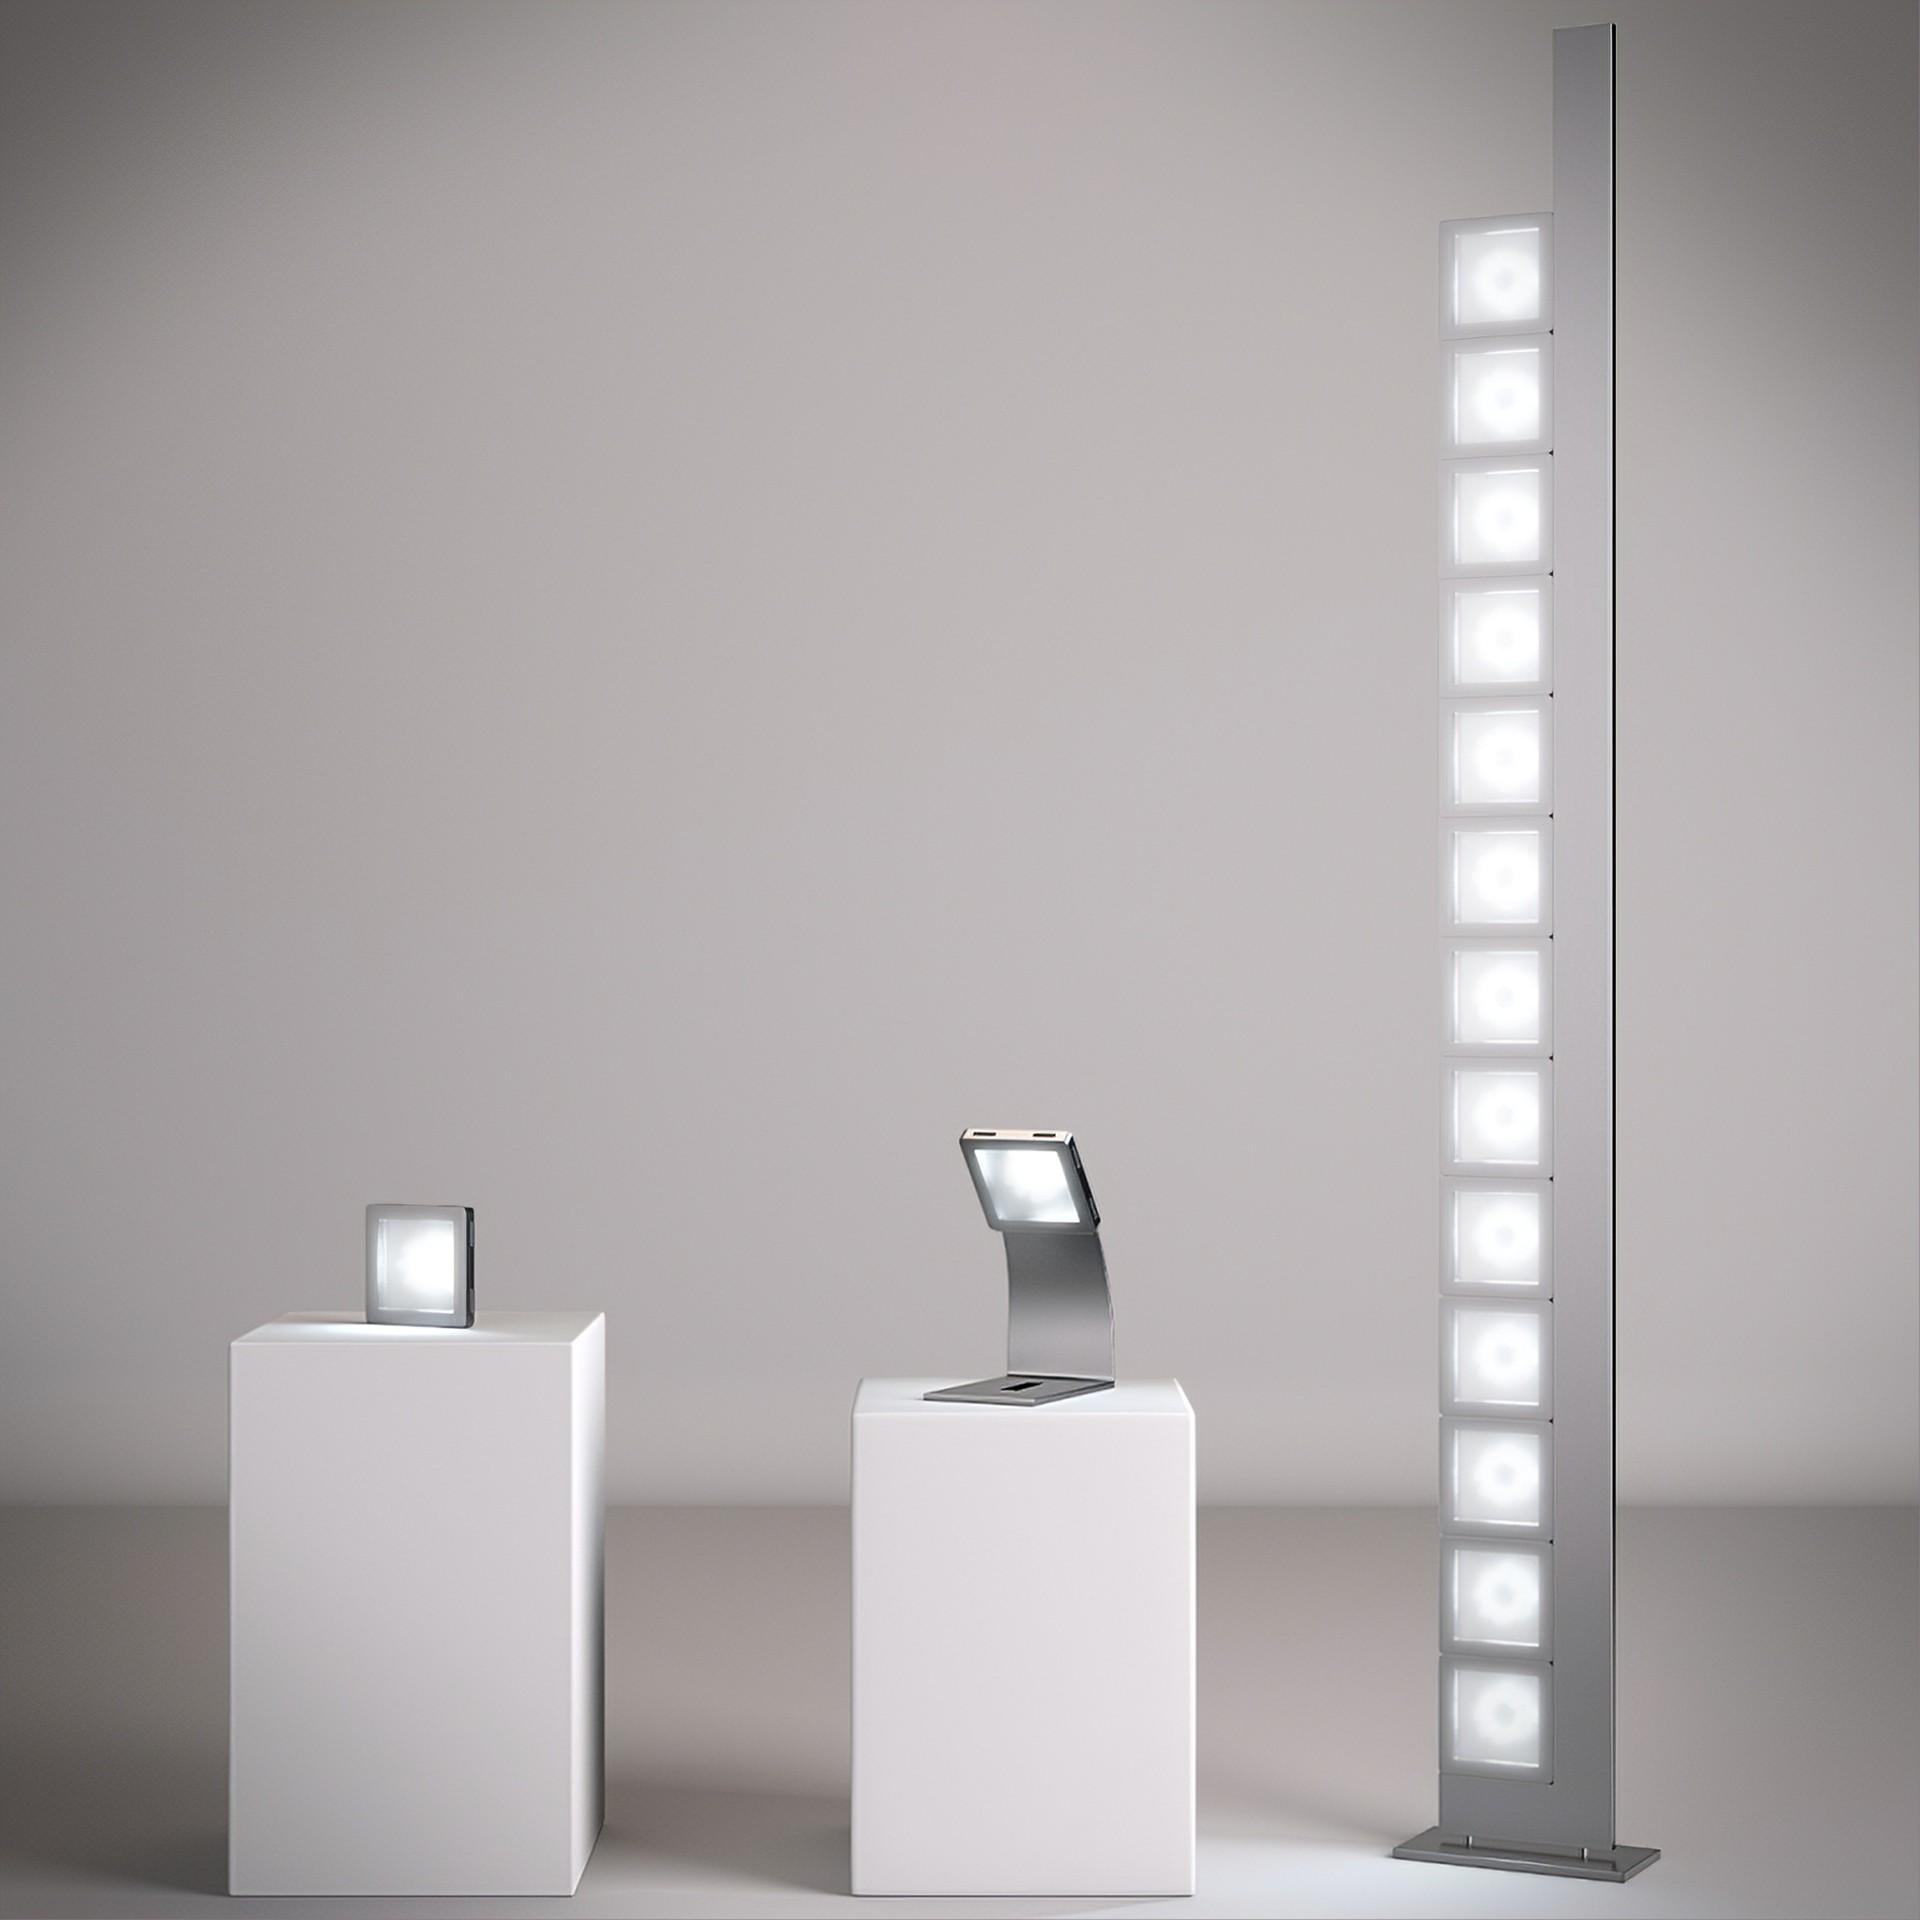 Federico abram light module 07